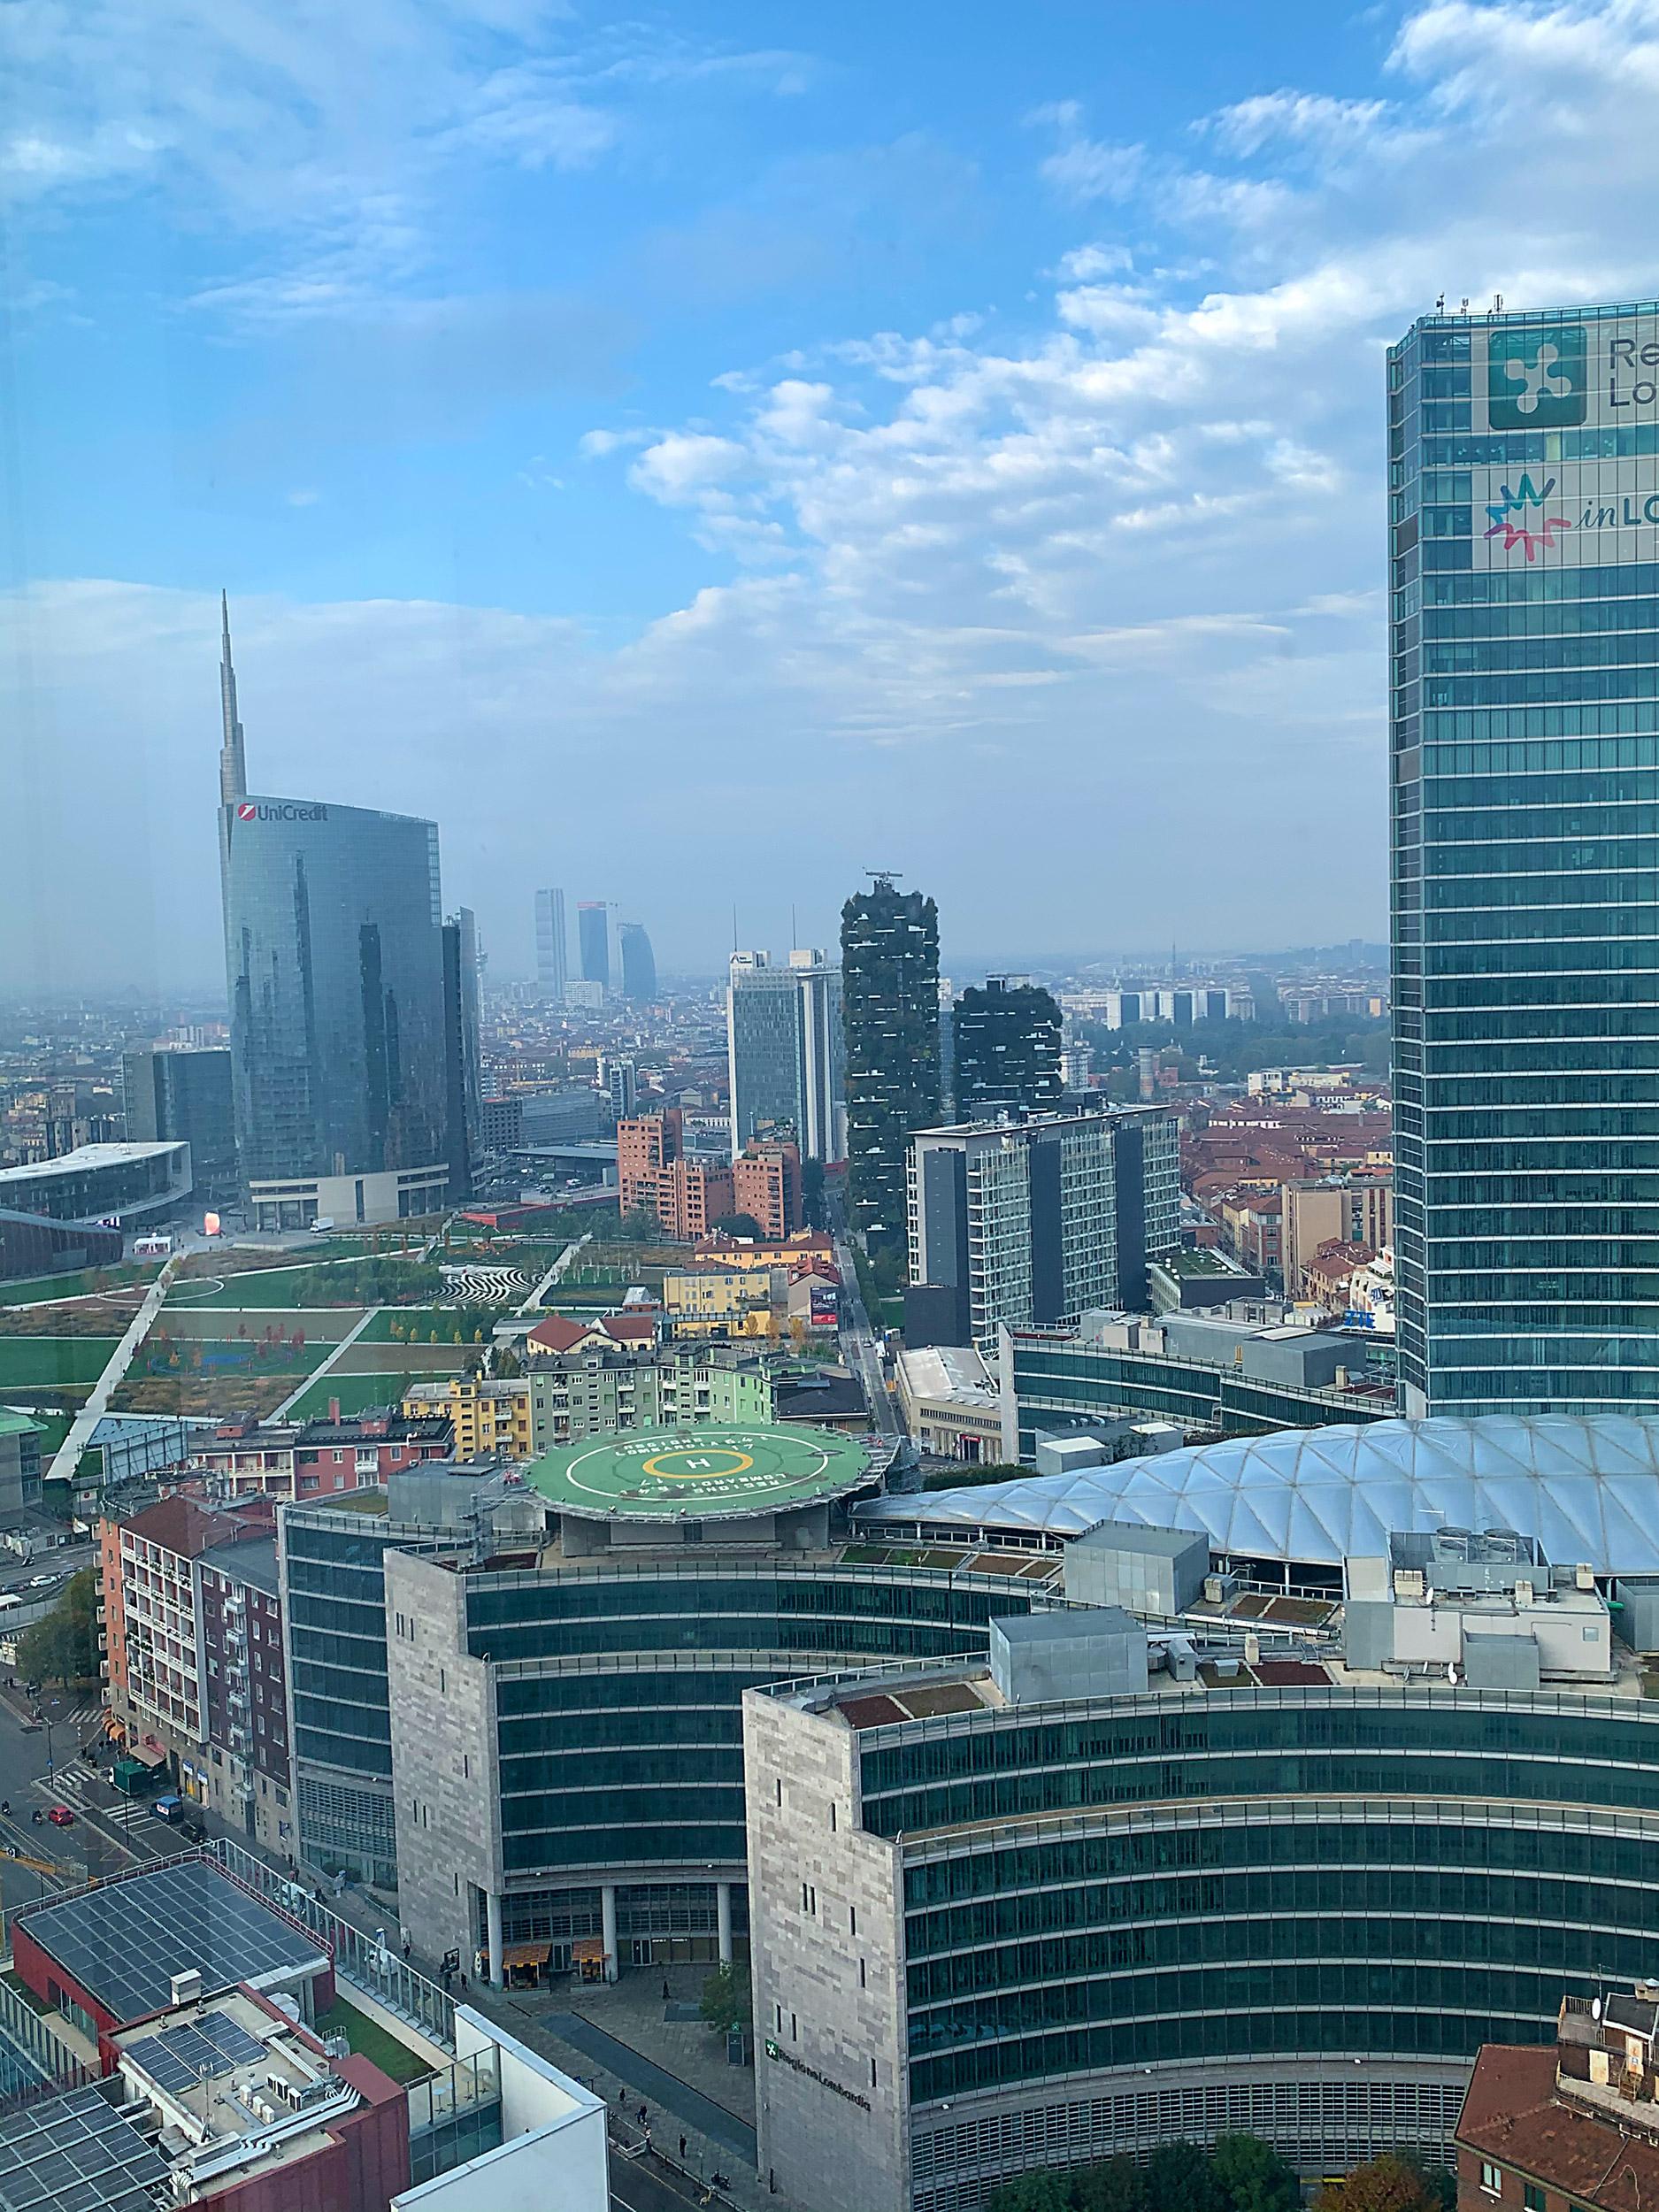 Panoramica dal 29° piano di Torre Galfa. Photo ©2019 by Alex Bonacina